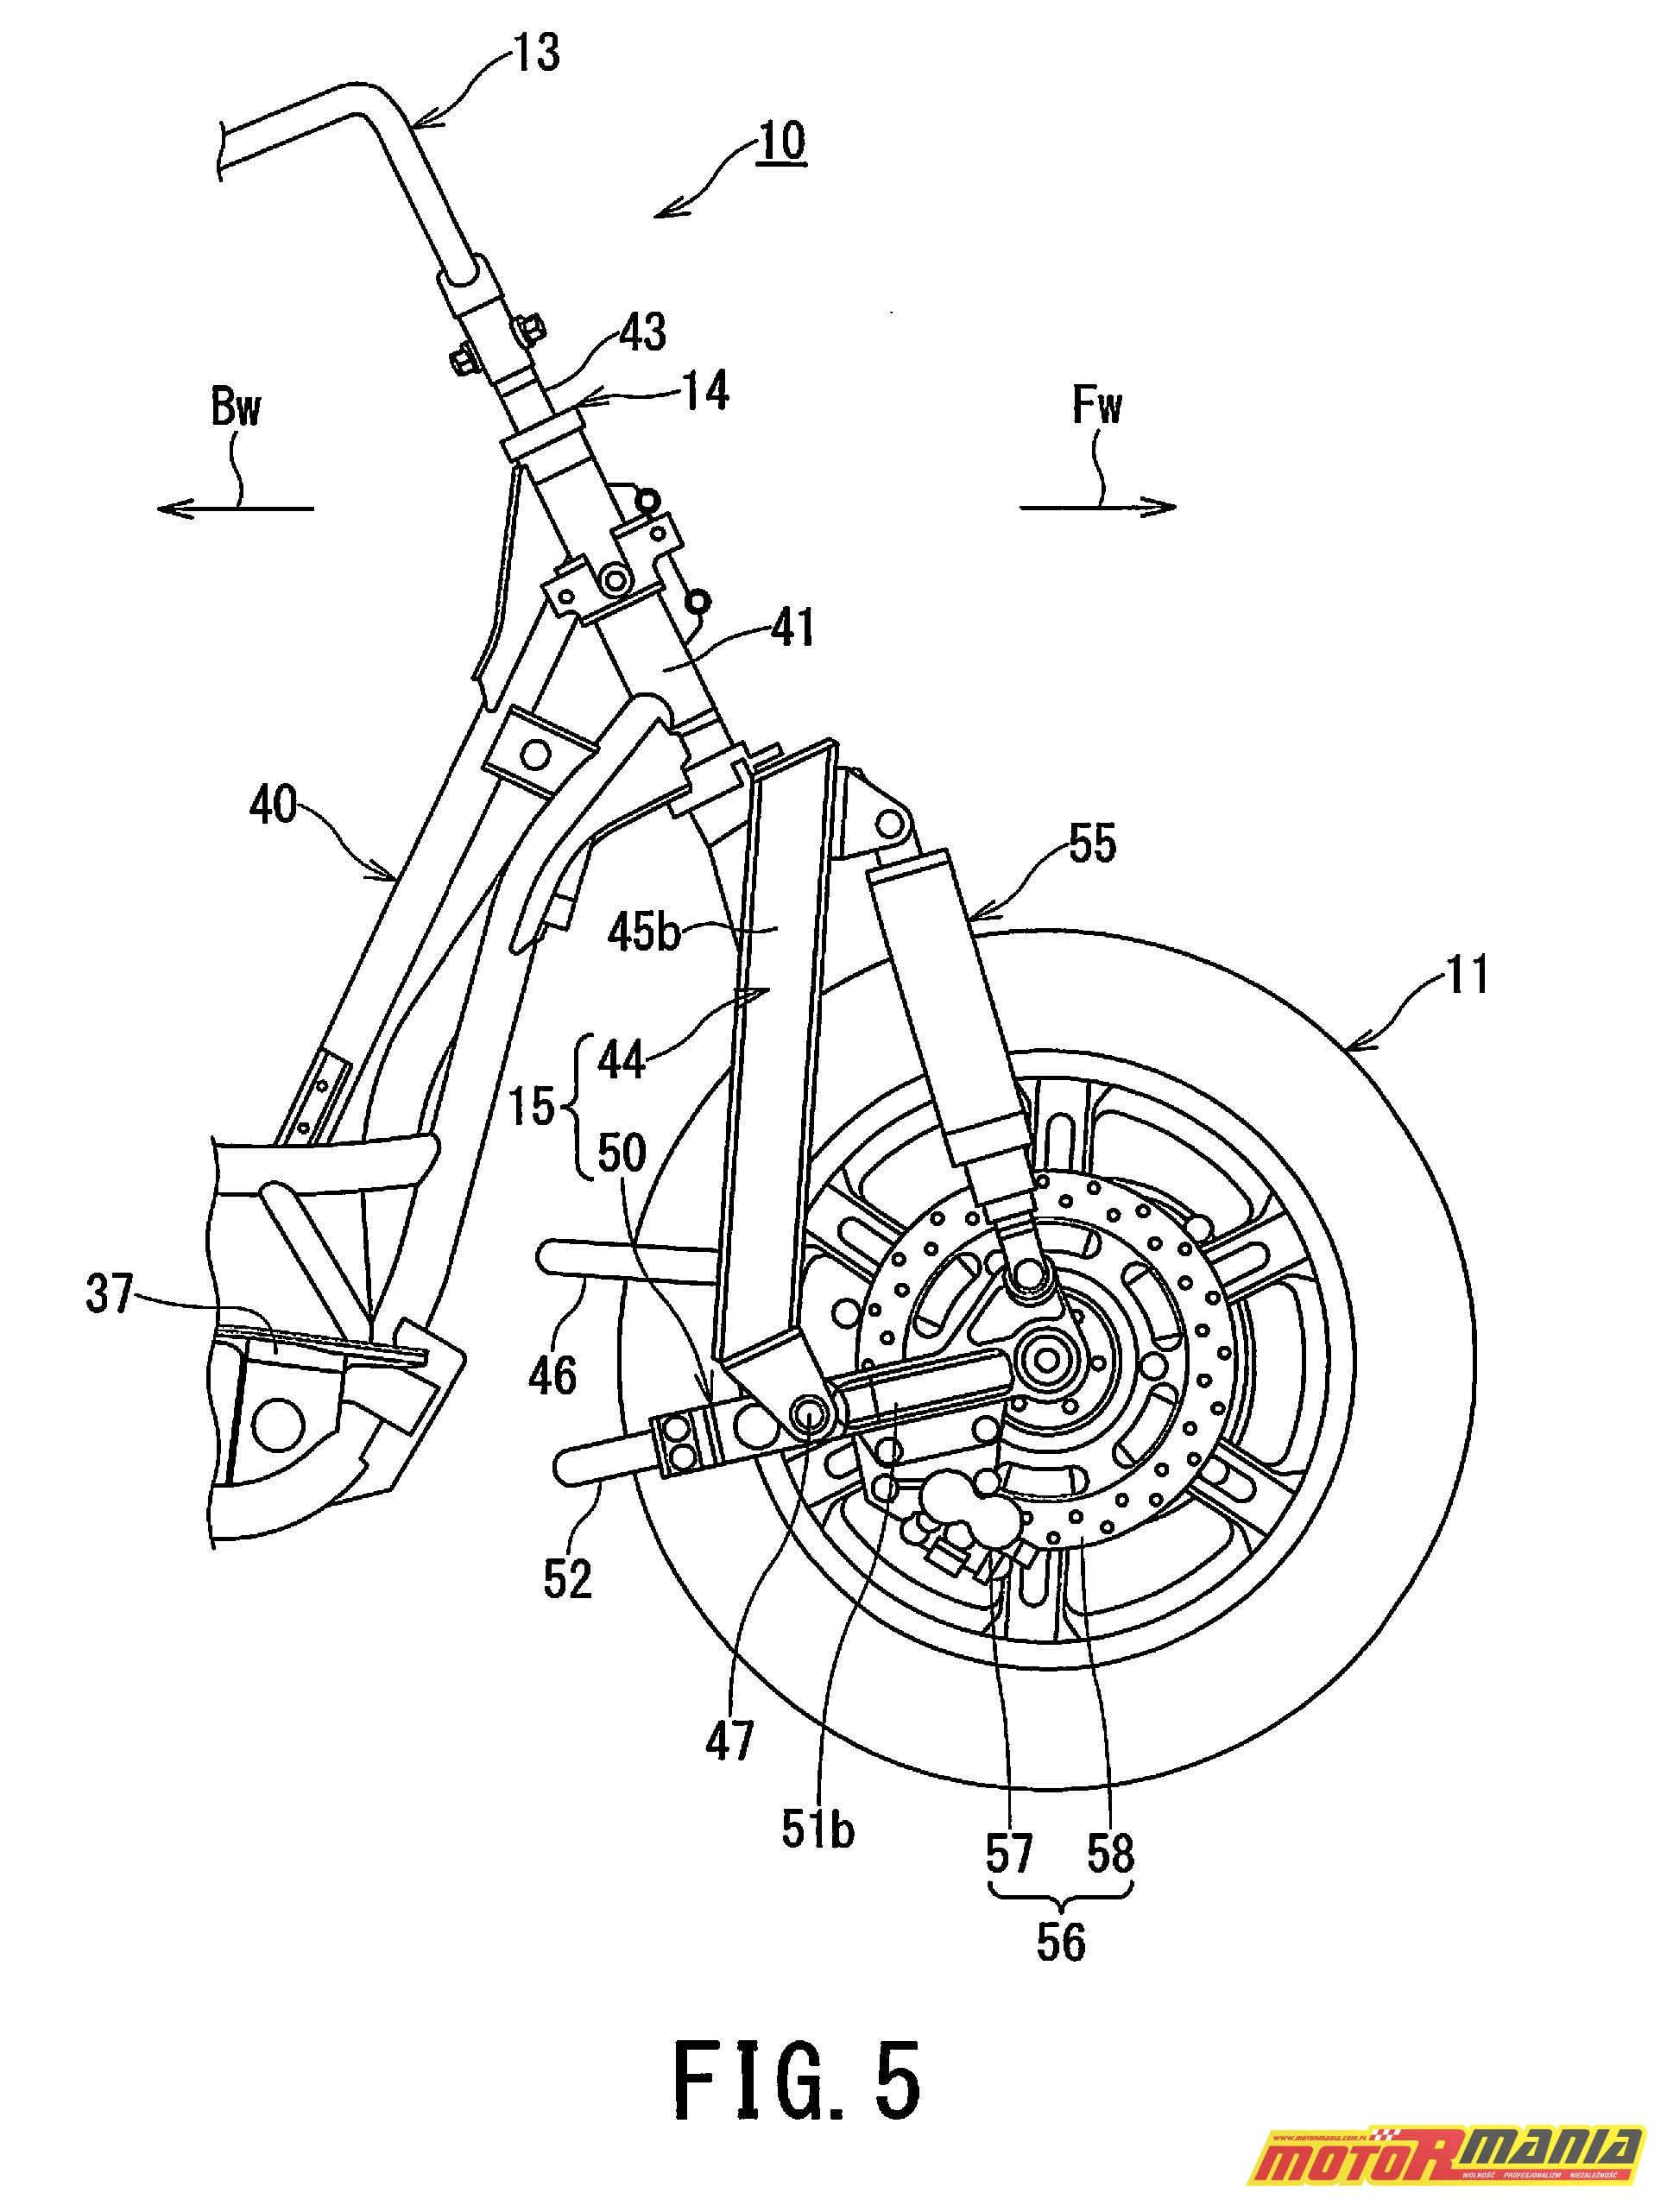 Suzuki Burgman 2WD hybryda elektryk - diagram (5)